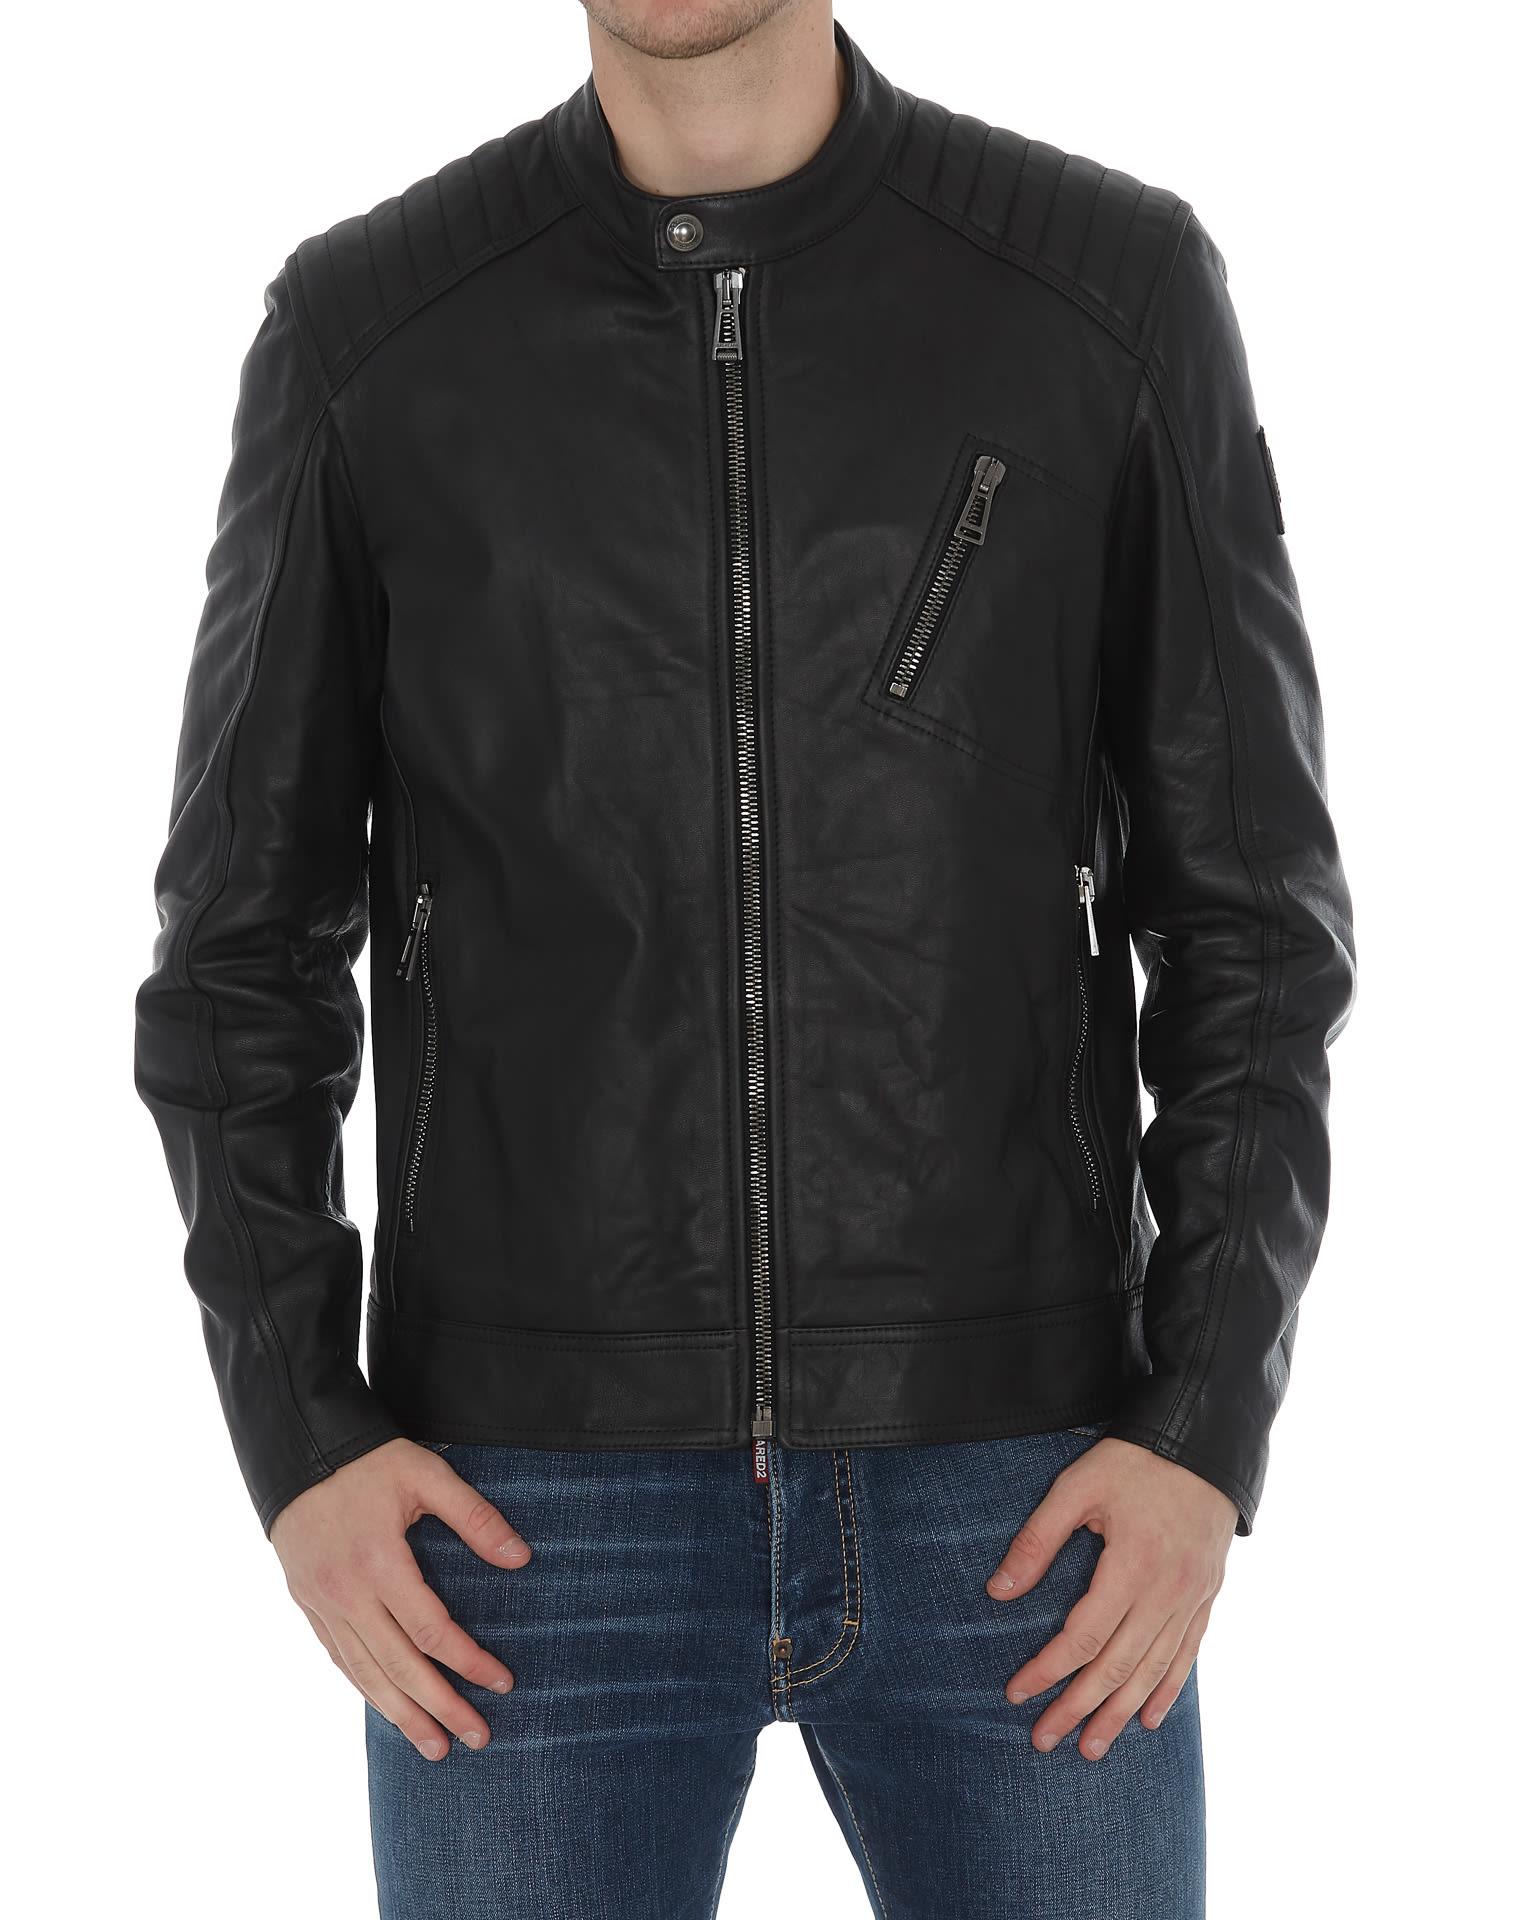 special sales fashion styles arriving Belstaff Belstaff Leather Jacket - Black - 11014840 | italist